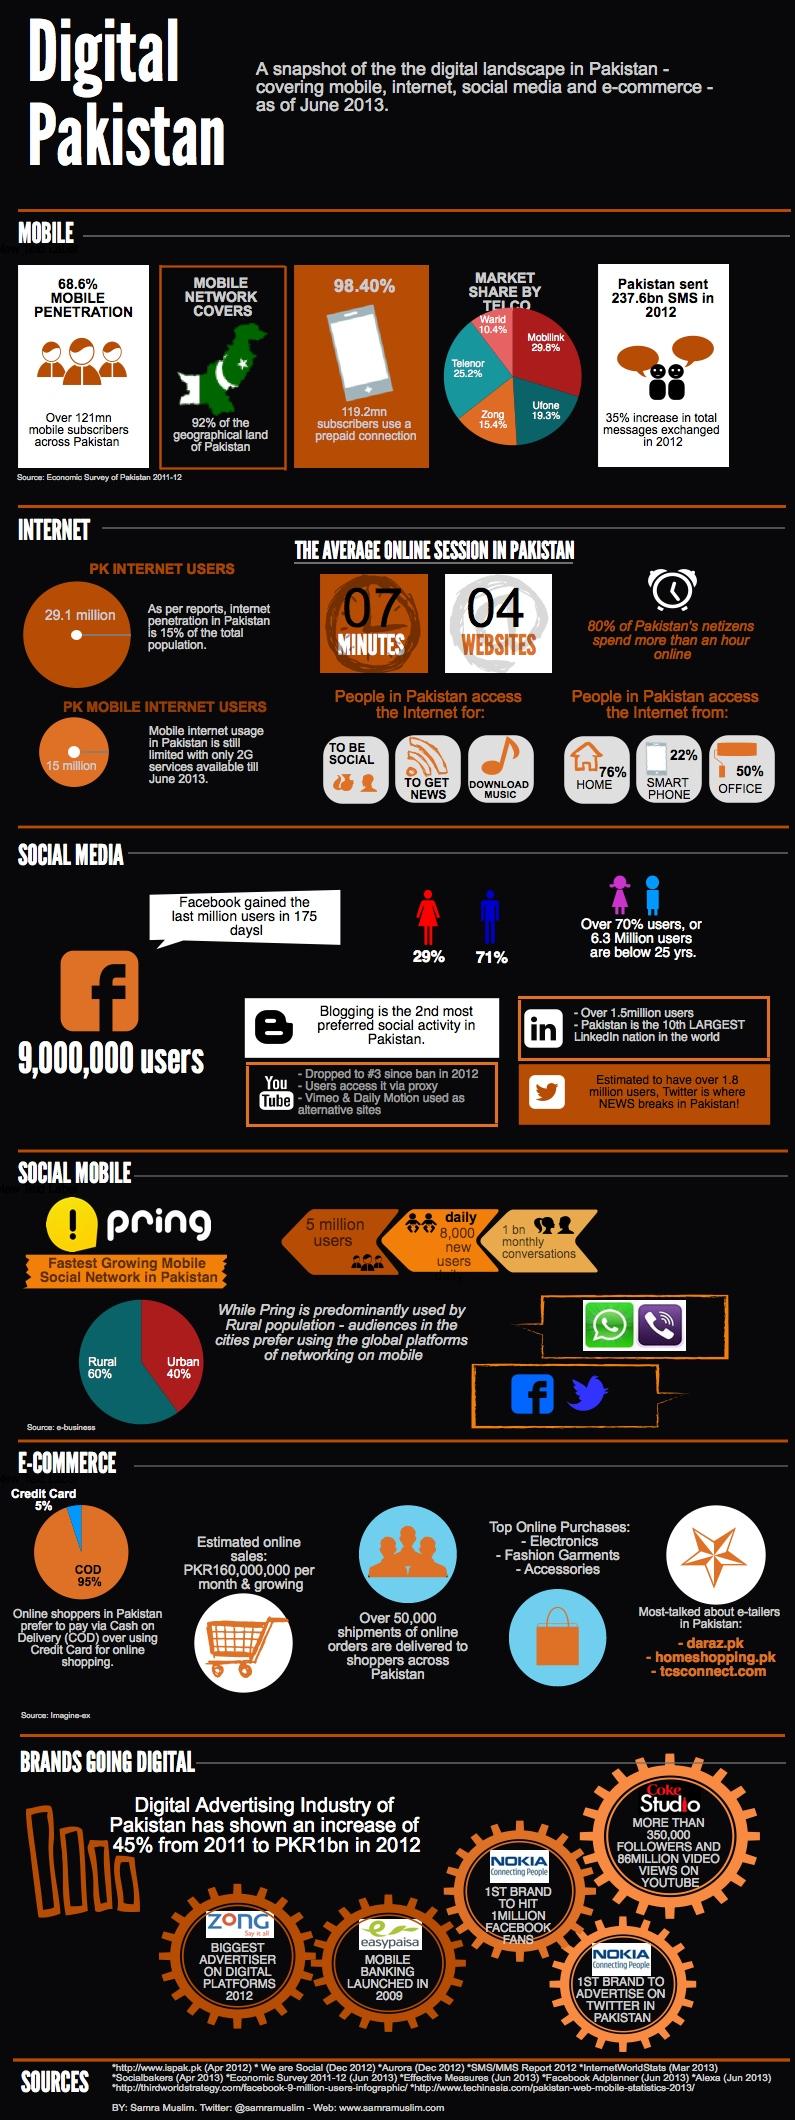 Digital Pakistan infographic, June 2013